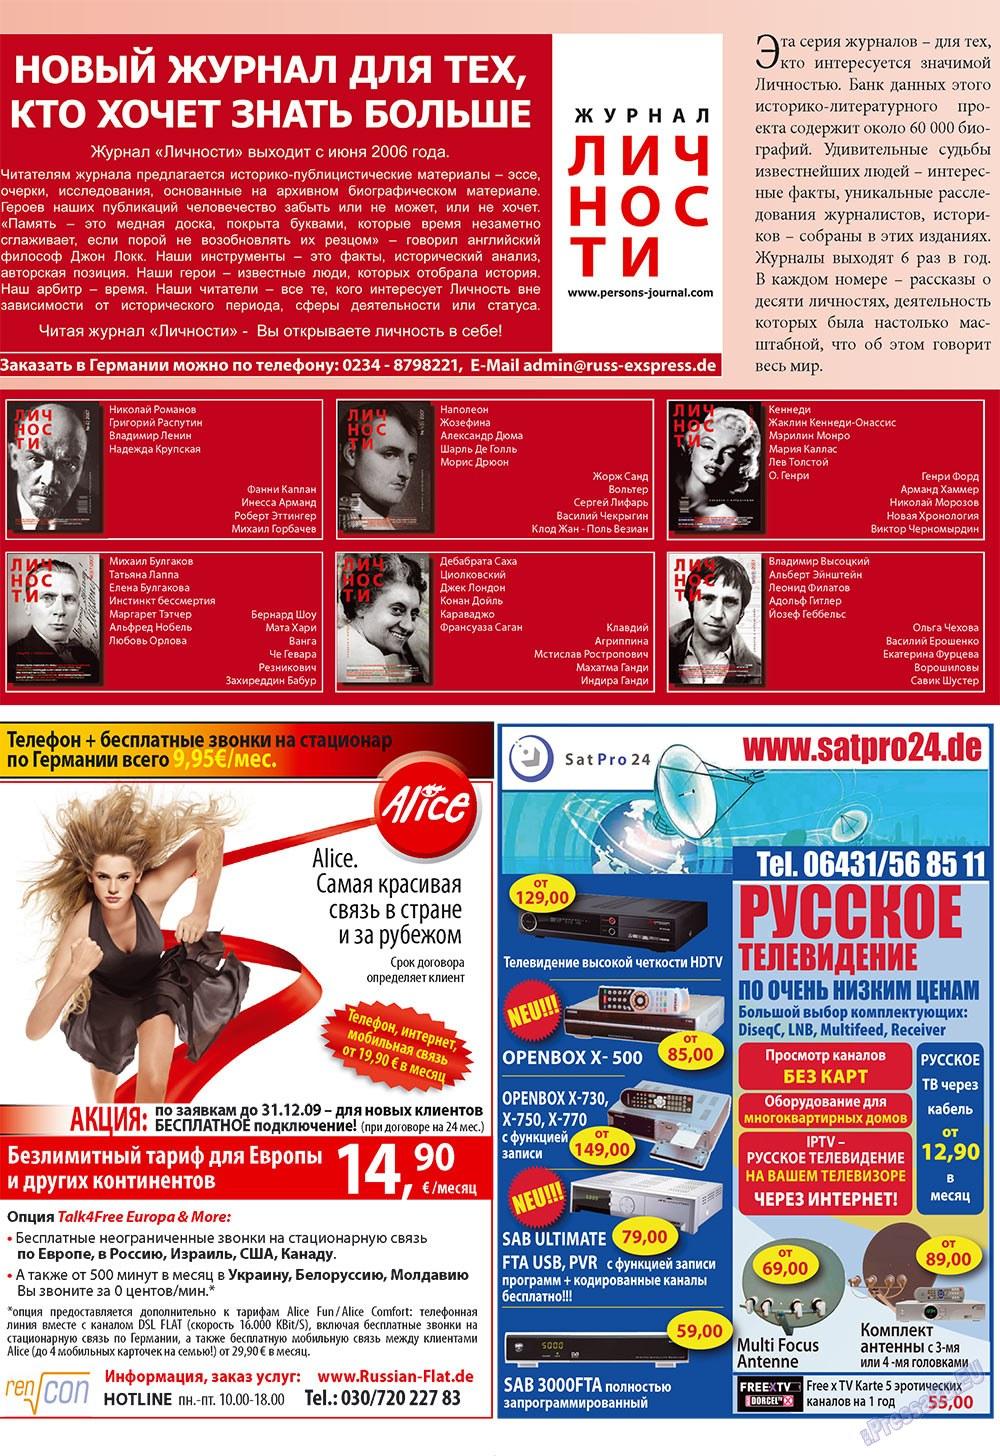 Наше Турбюро (журнал). 2009 год, номер 5, стр. 66